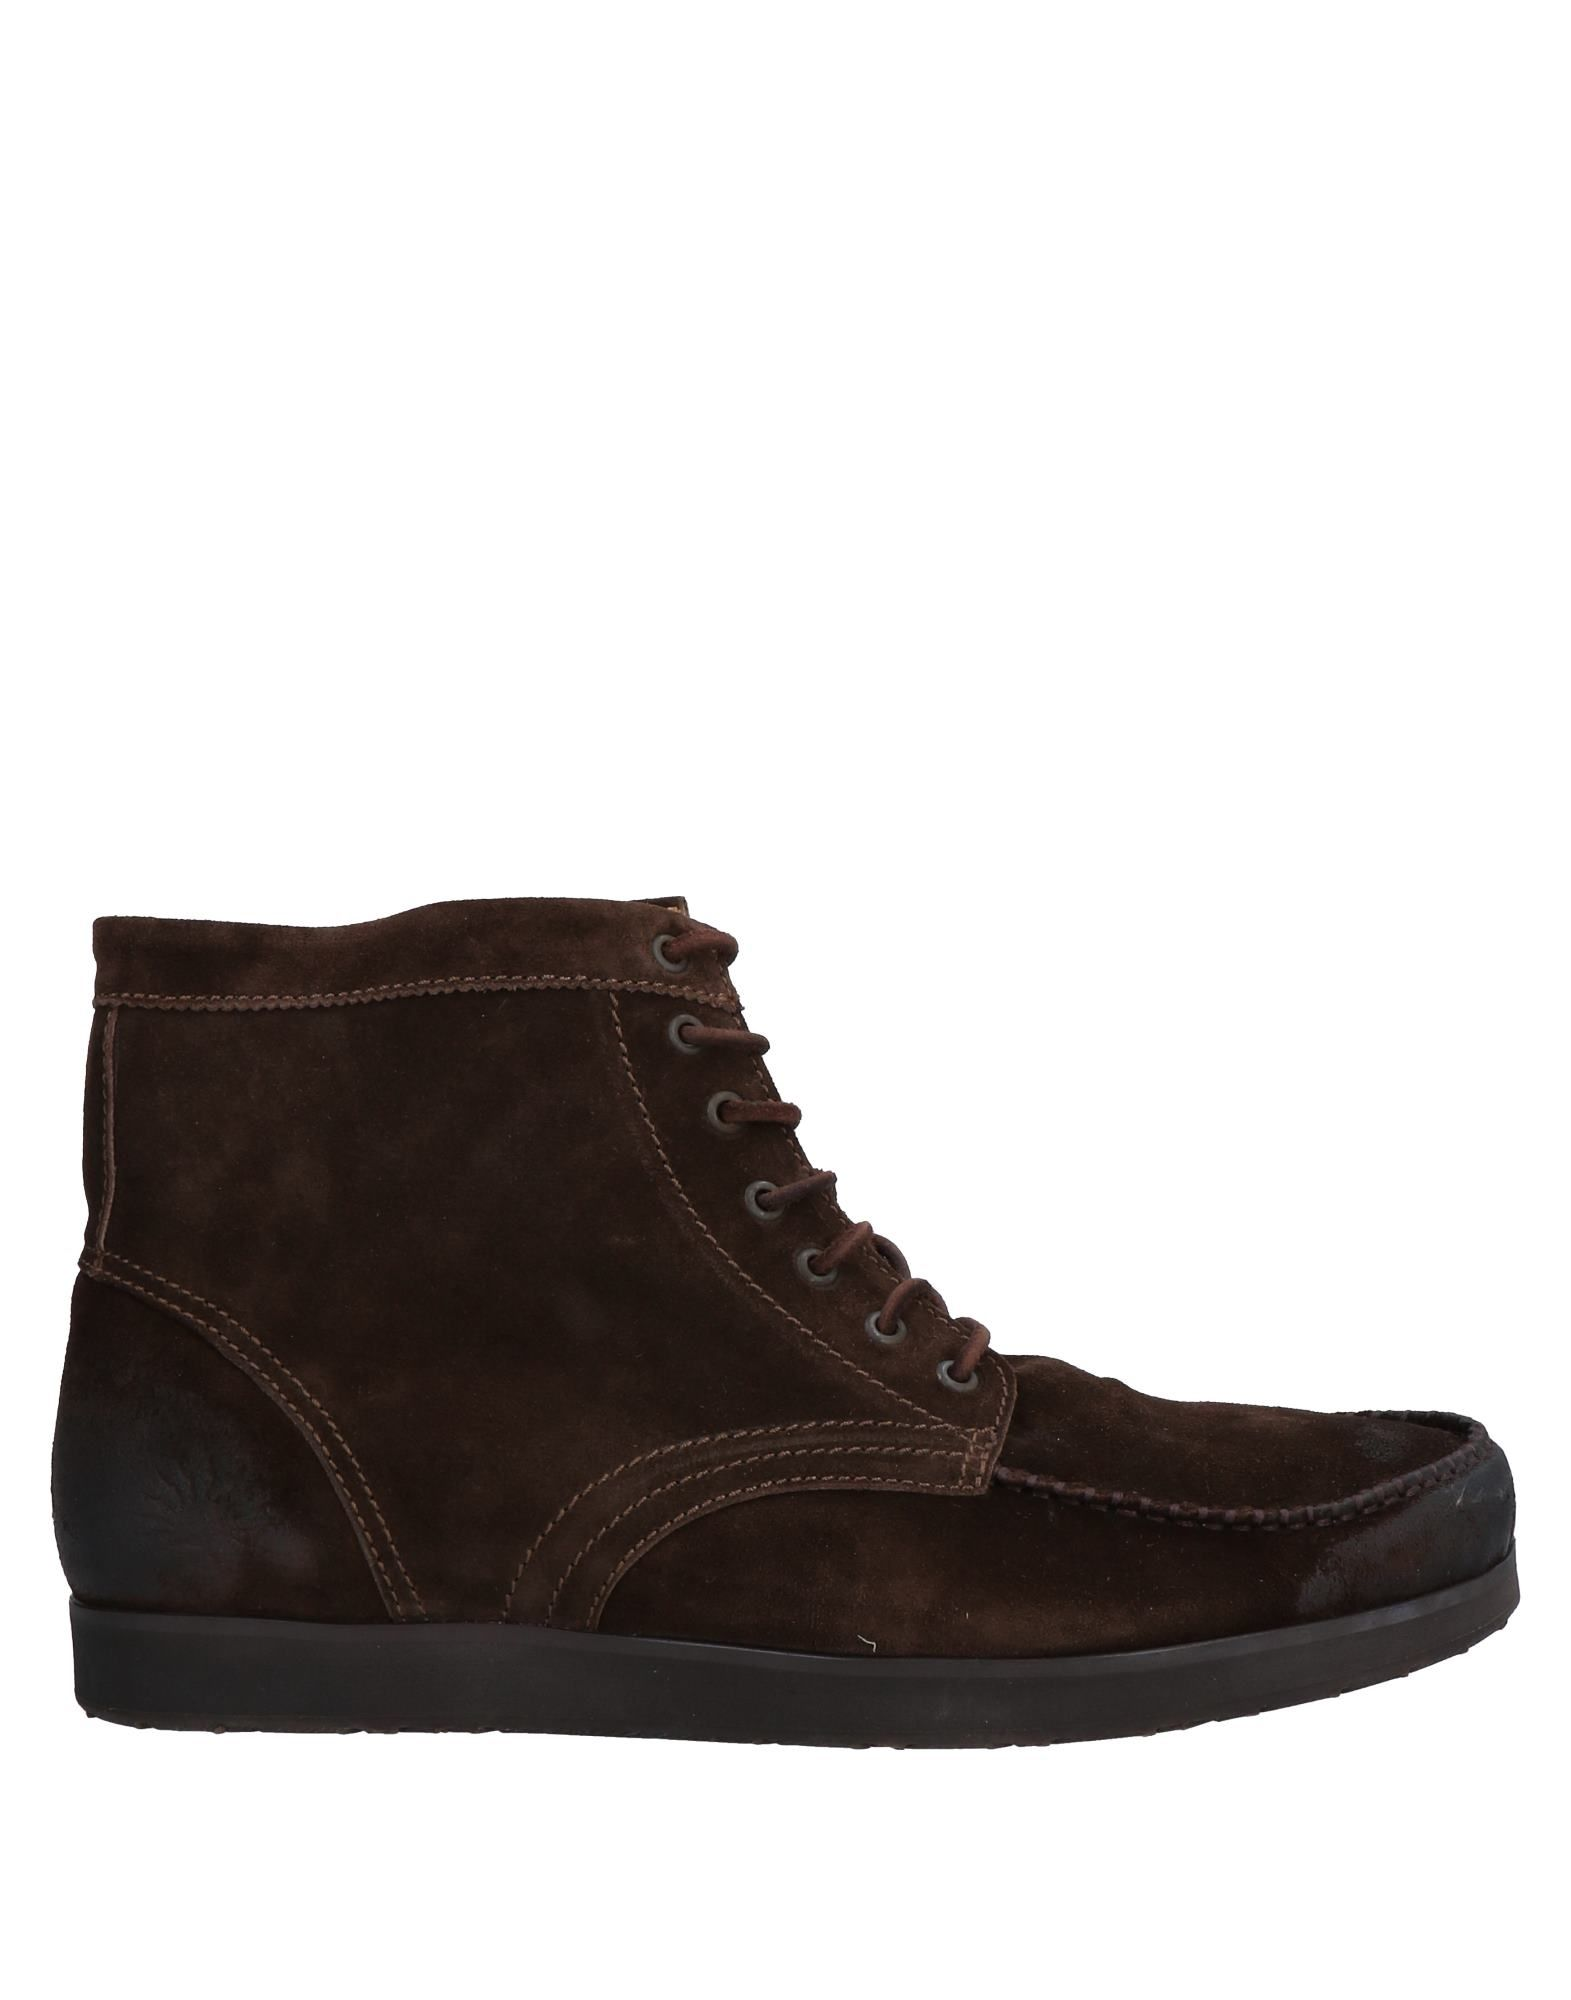 Rokin Boots - Men  Rokin Boots online on  Men Canada - 11581740BO 3fdcf6